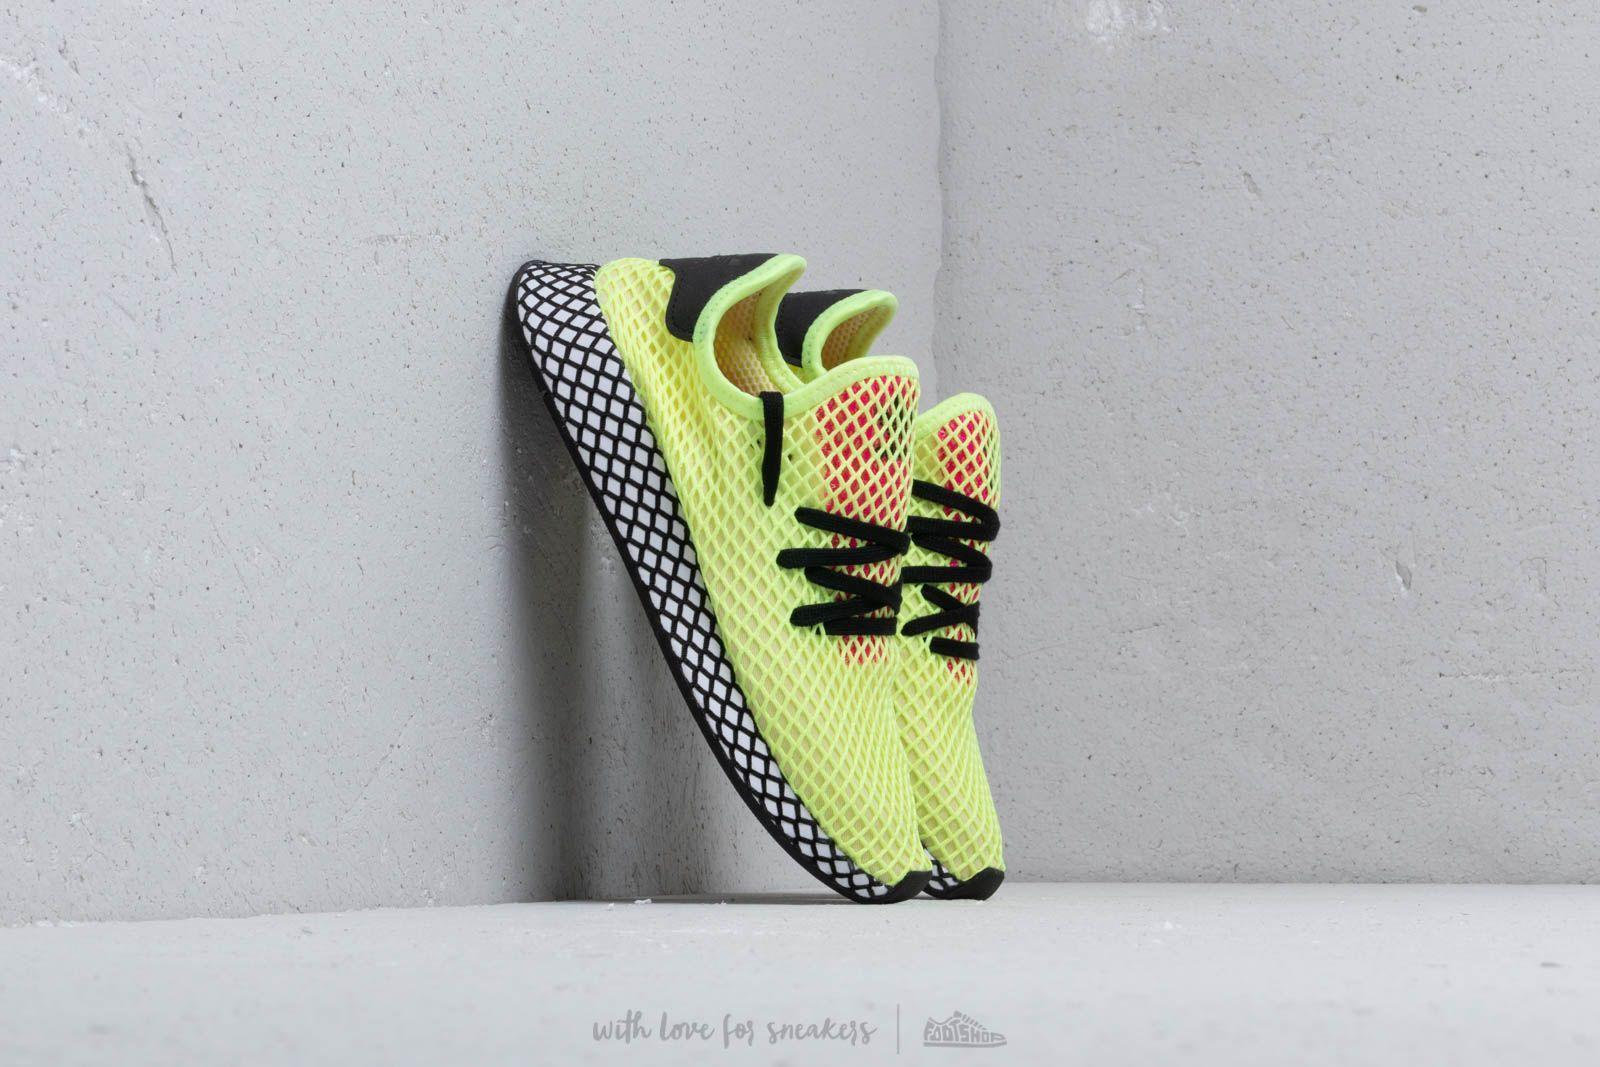 620d4aa78f3 Lyst - adidas Originals Adidas Deerupt Runner Hireye  Core Black ...